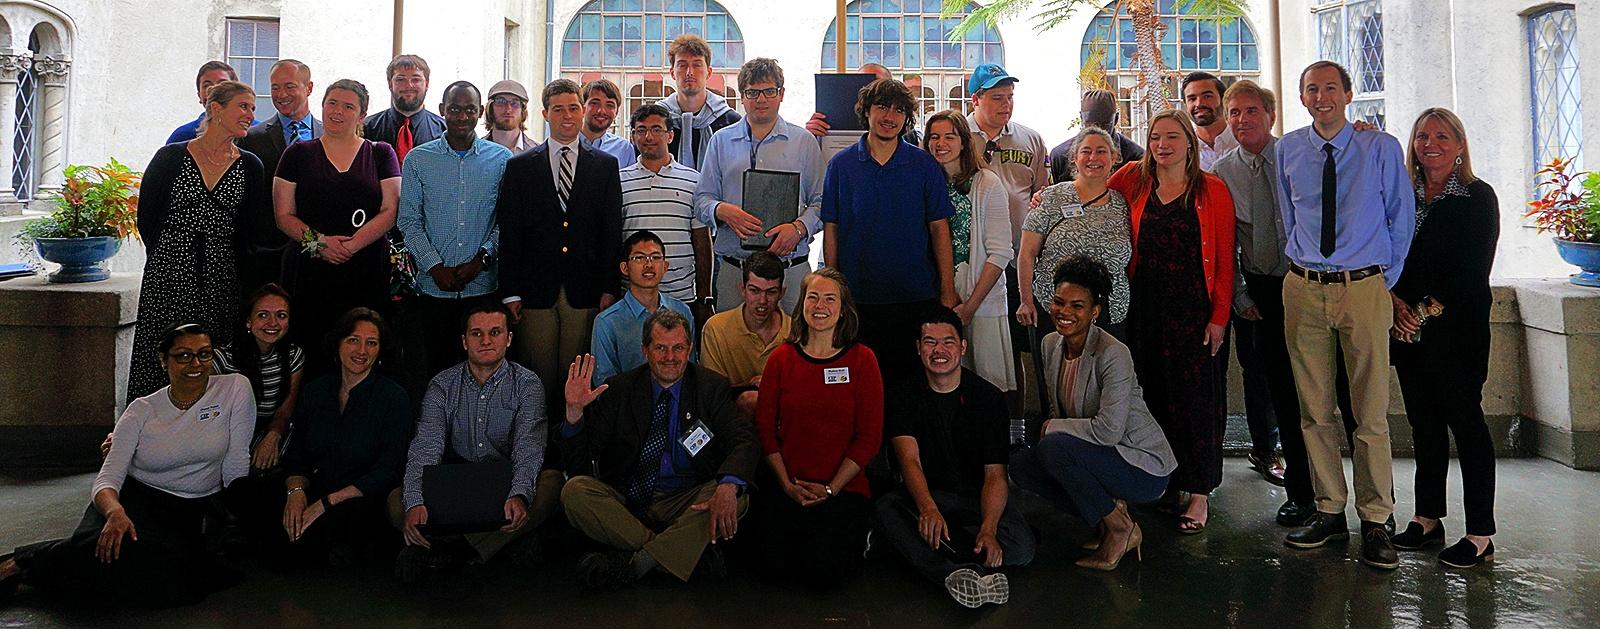 Berkeley Convocation